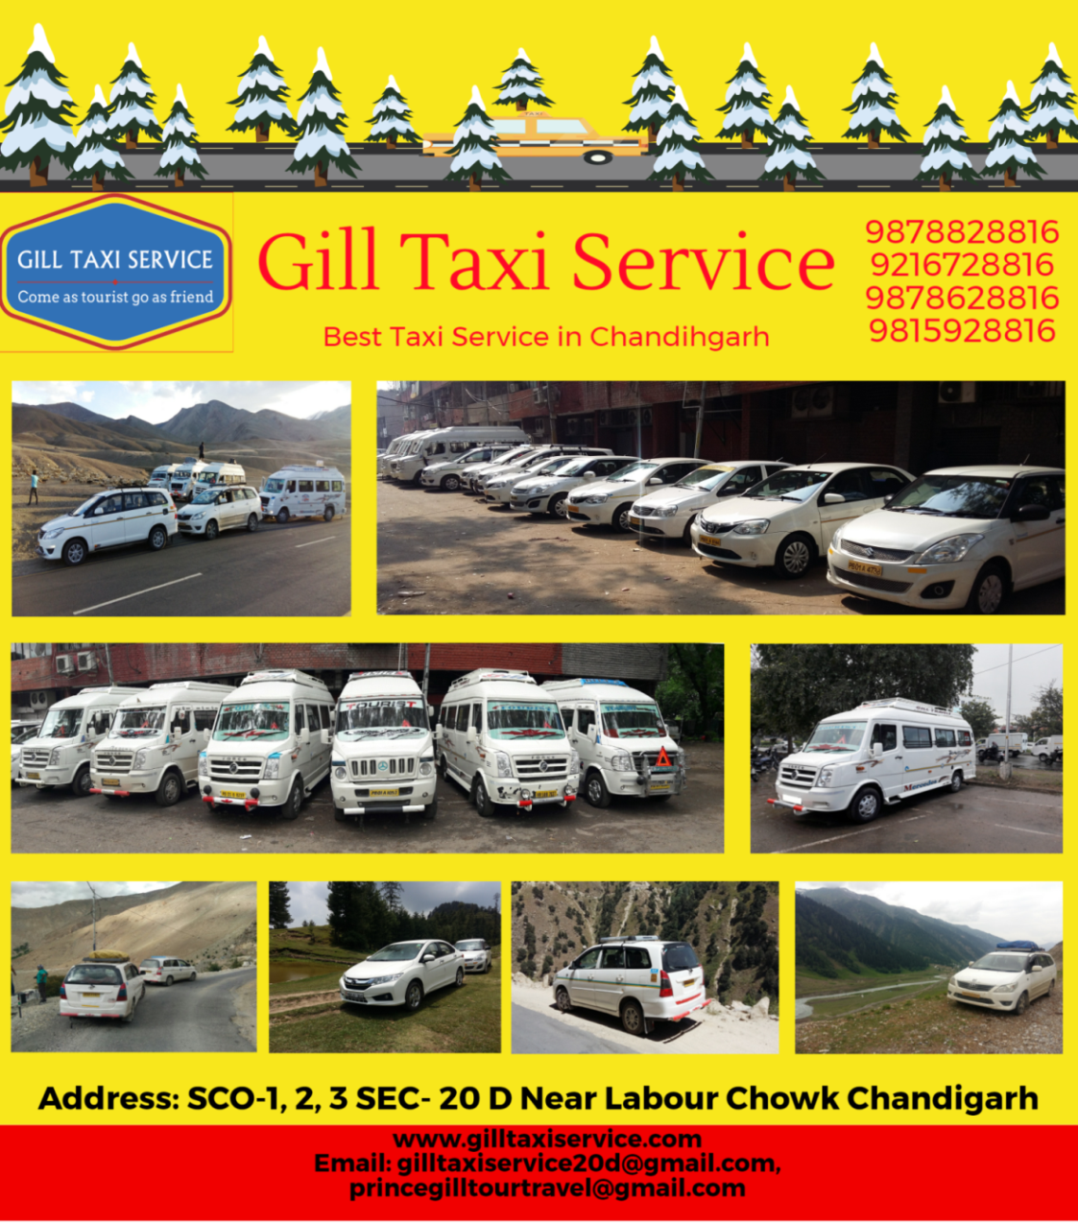 #Best #Taxi #Service In #Chandigarh #Shimla #Manali #Kalpa